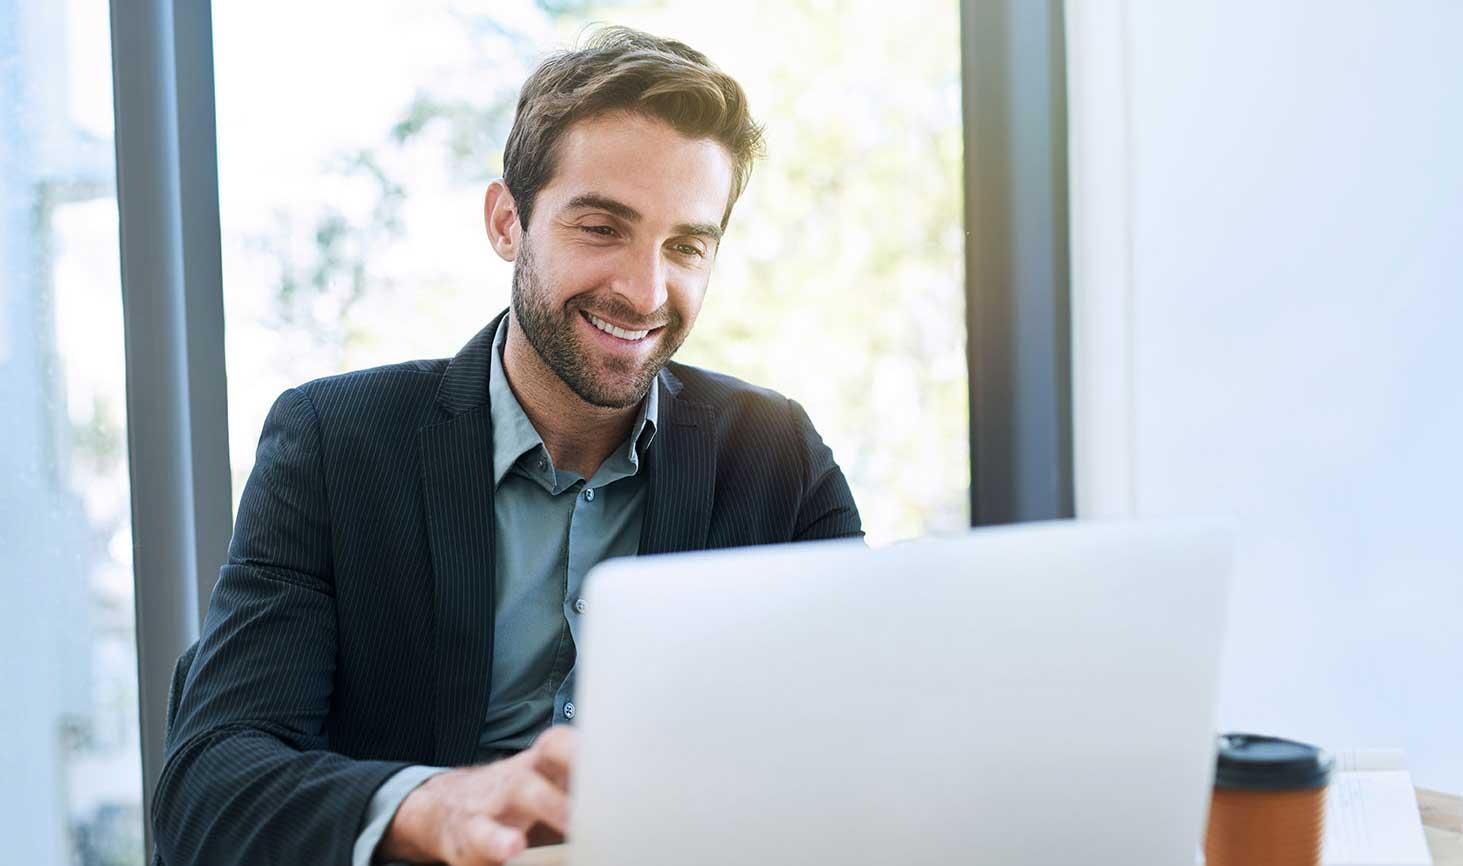 Business-man-behind-laptop-lowres-cropped.jpg